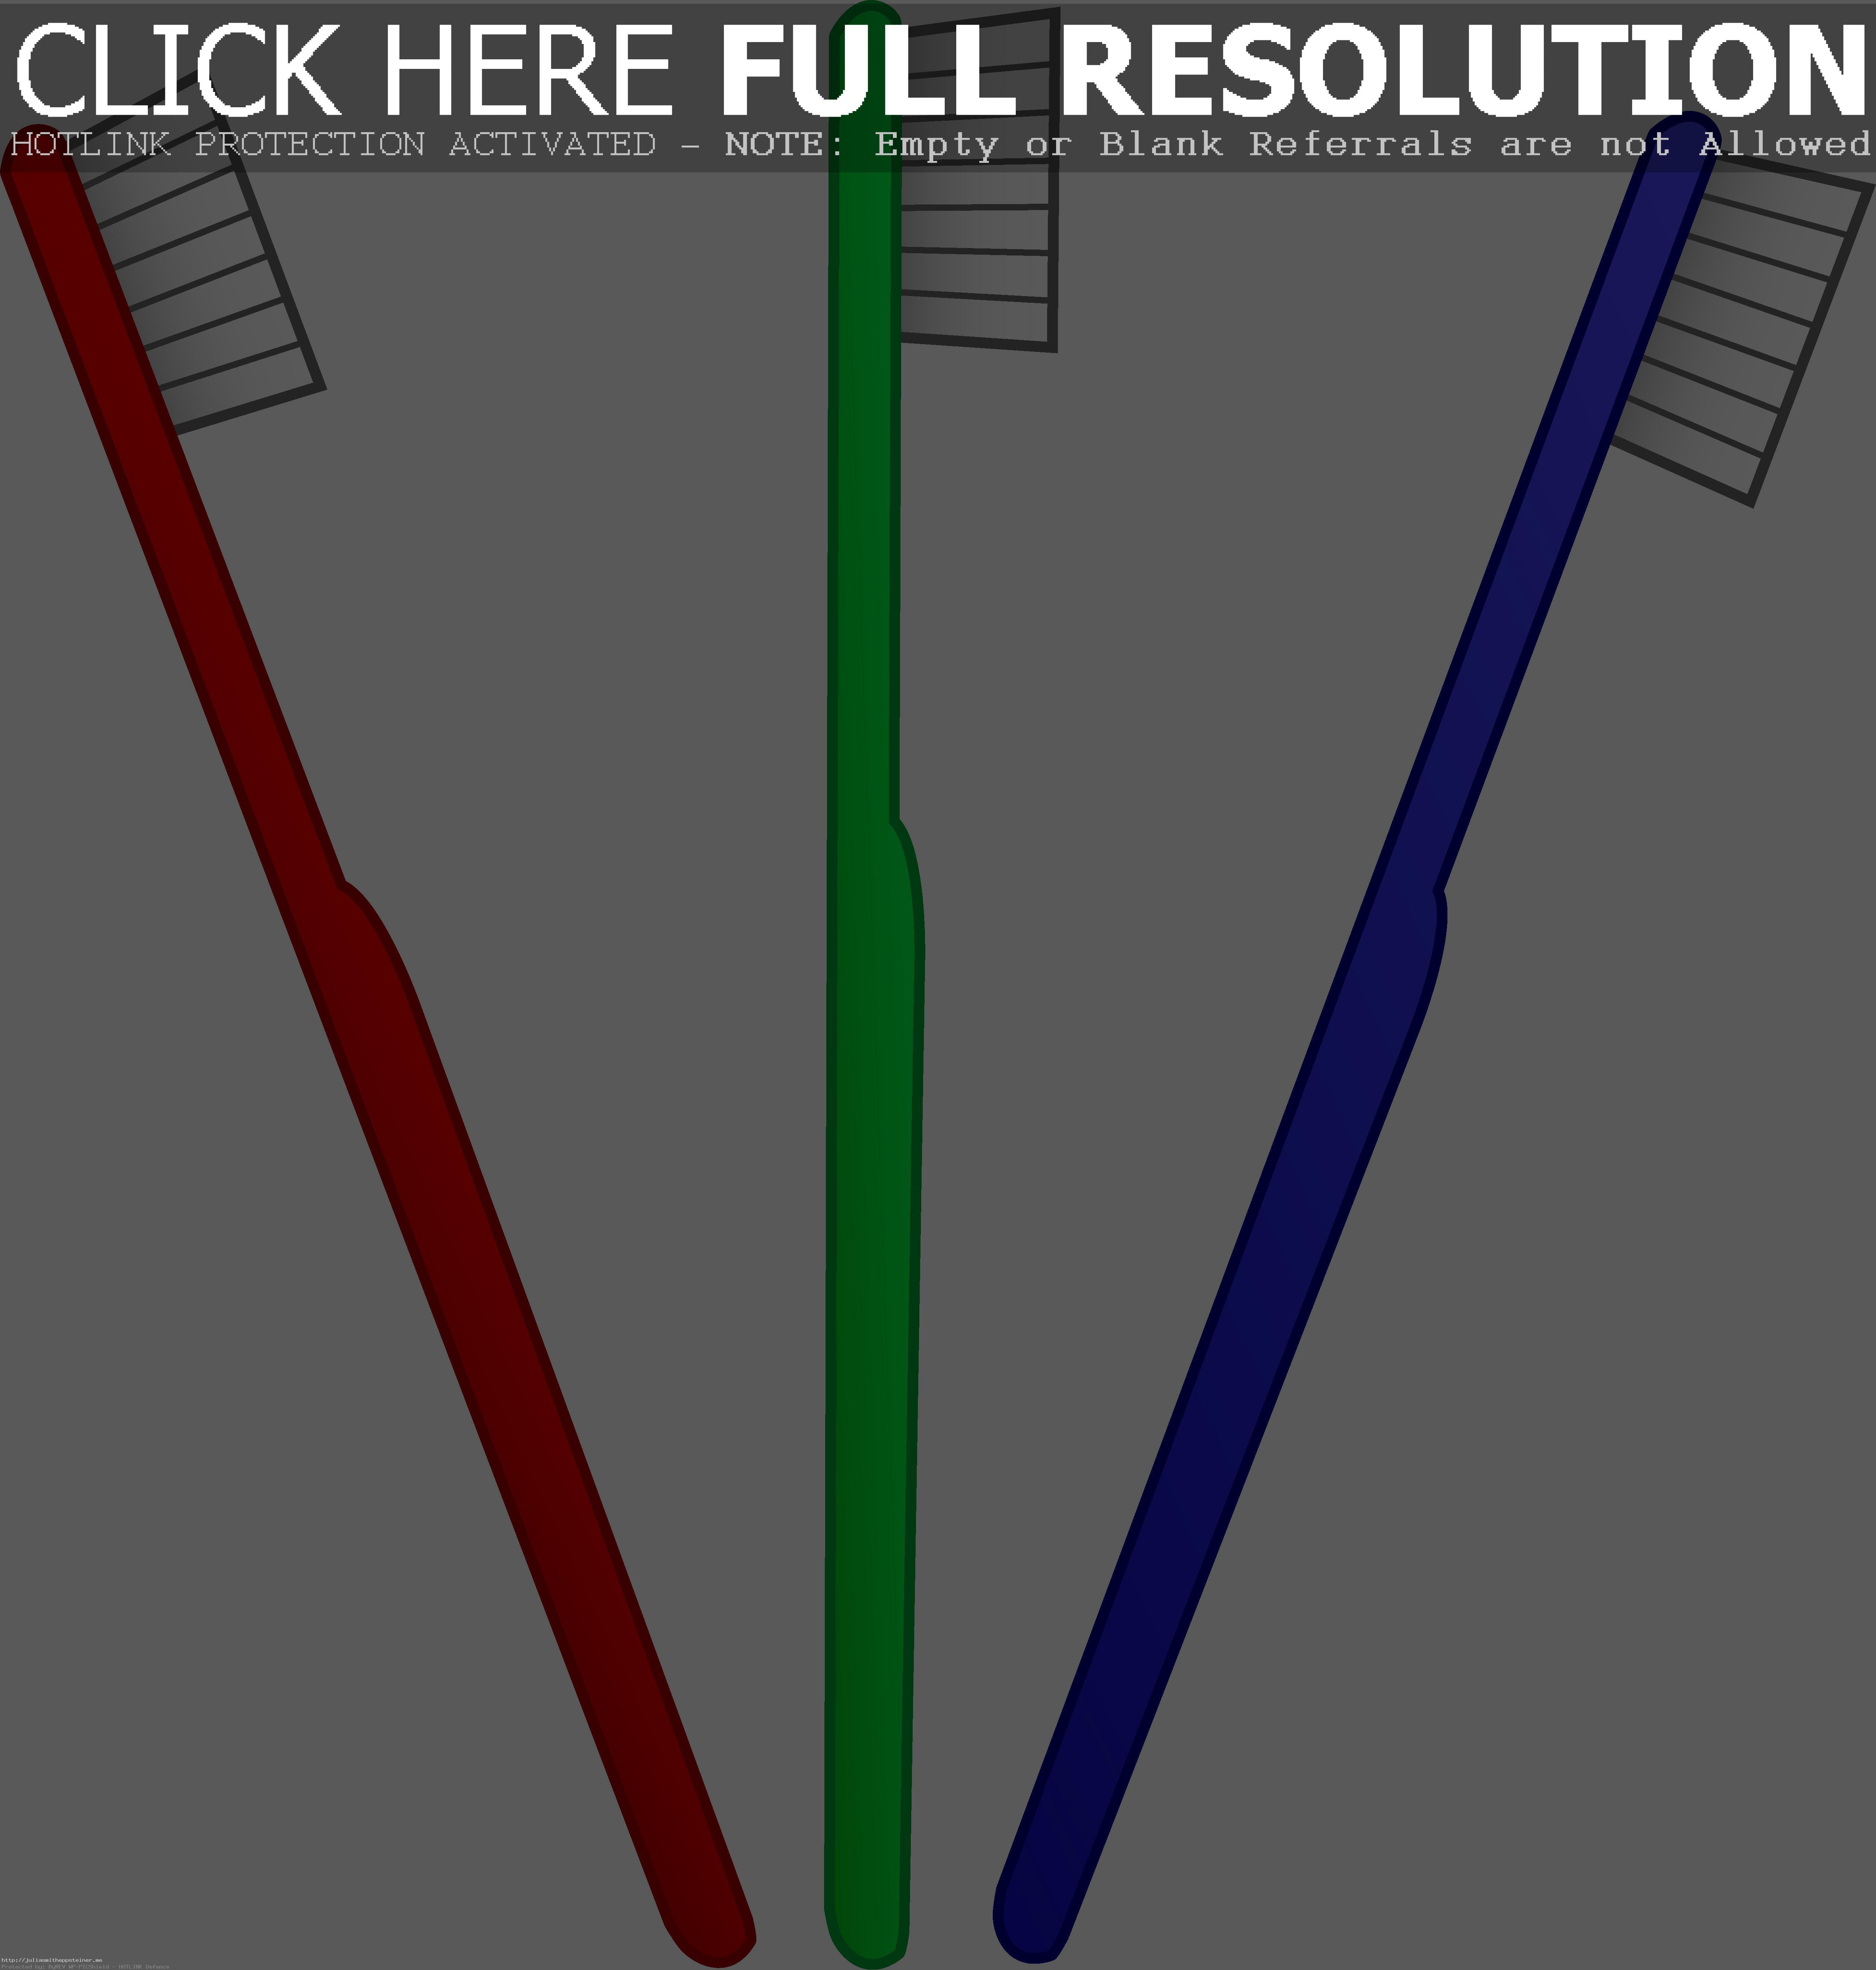 Three Toothbrushes Free Clip Art Endear -Three Toothbrushes Free Clip Art Endear Toothbrush ClipartLook.com -14